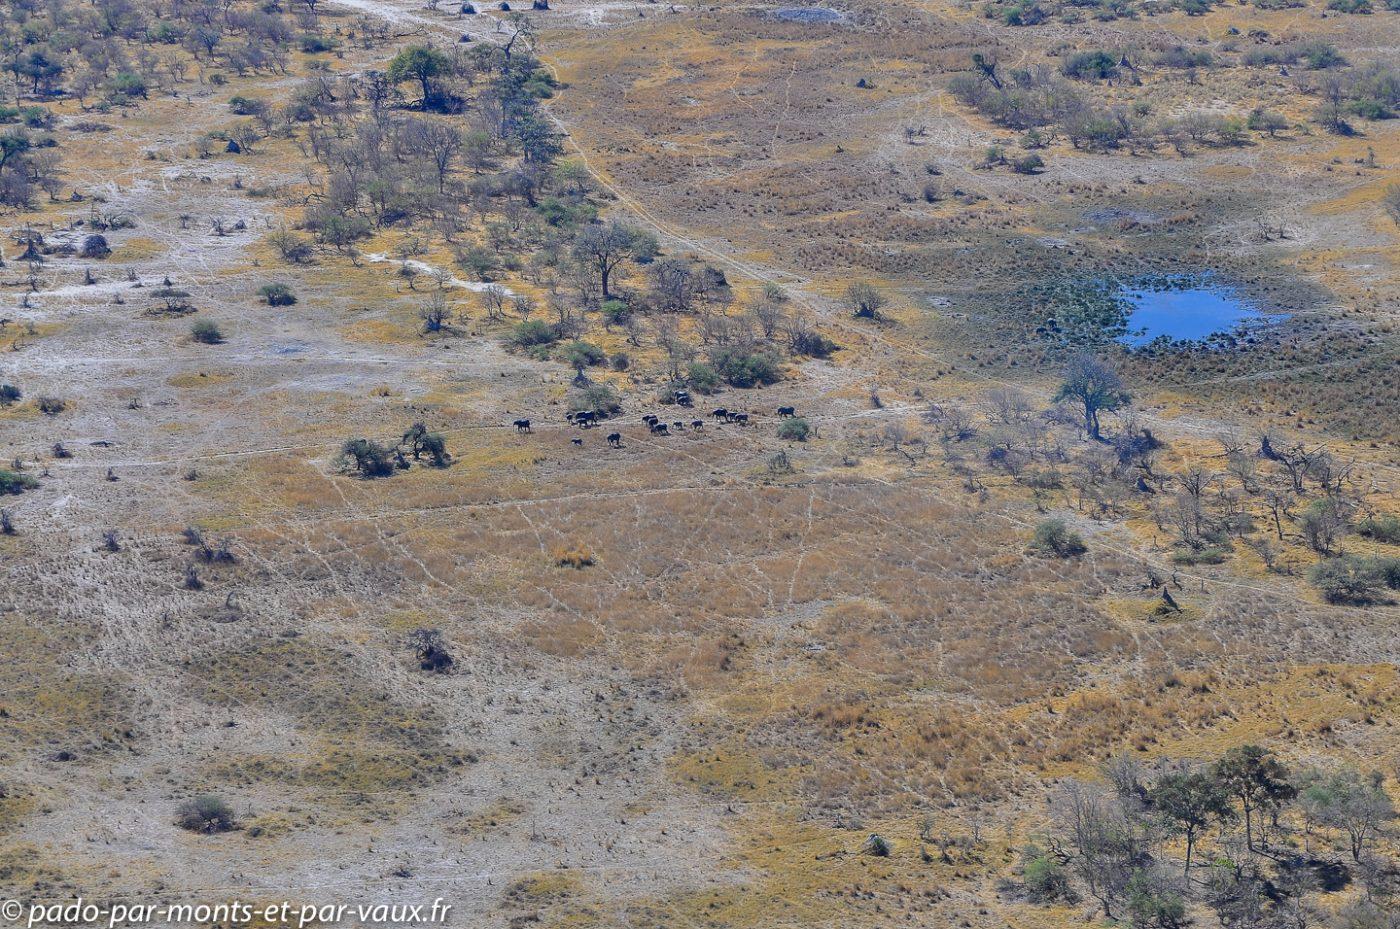 vol de Gunn's camp à Moremi - éléphants